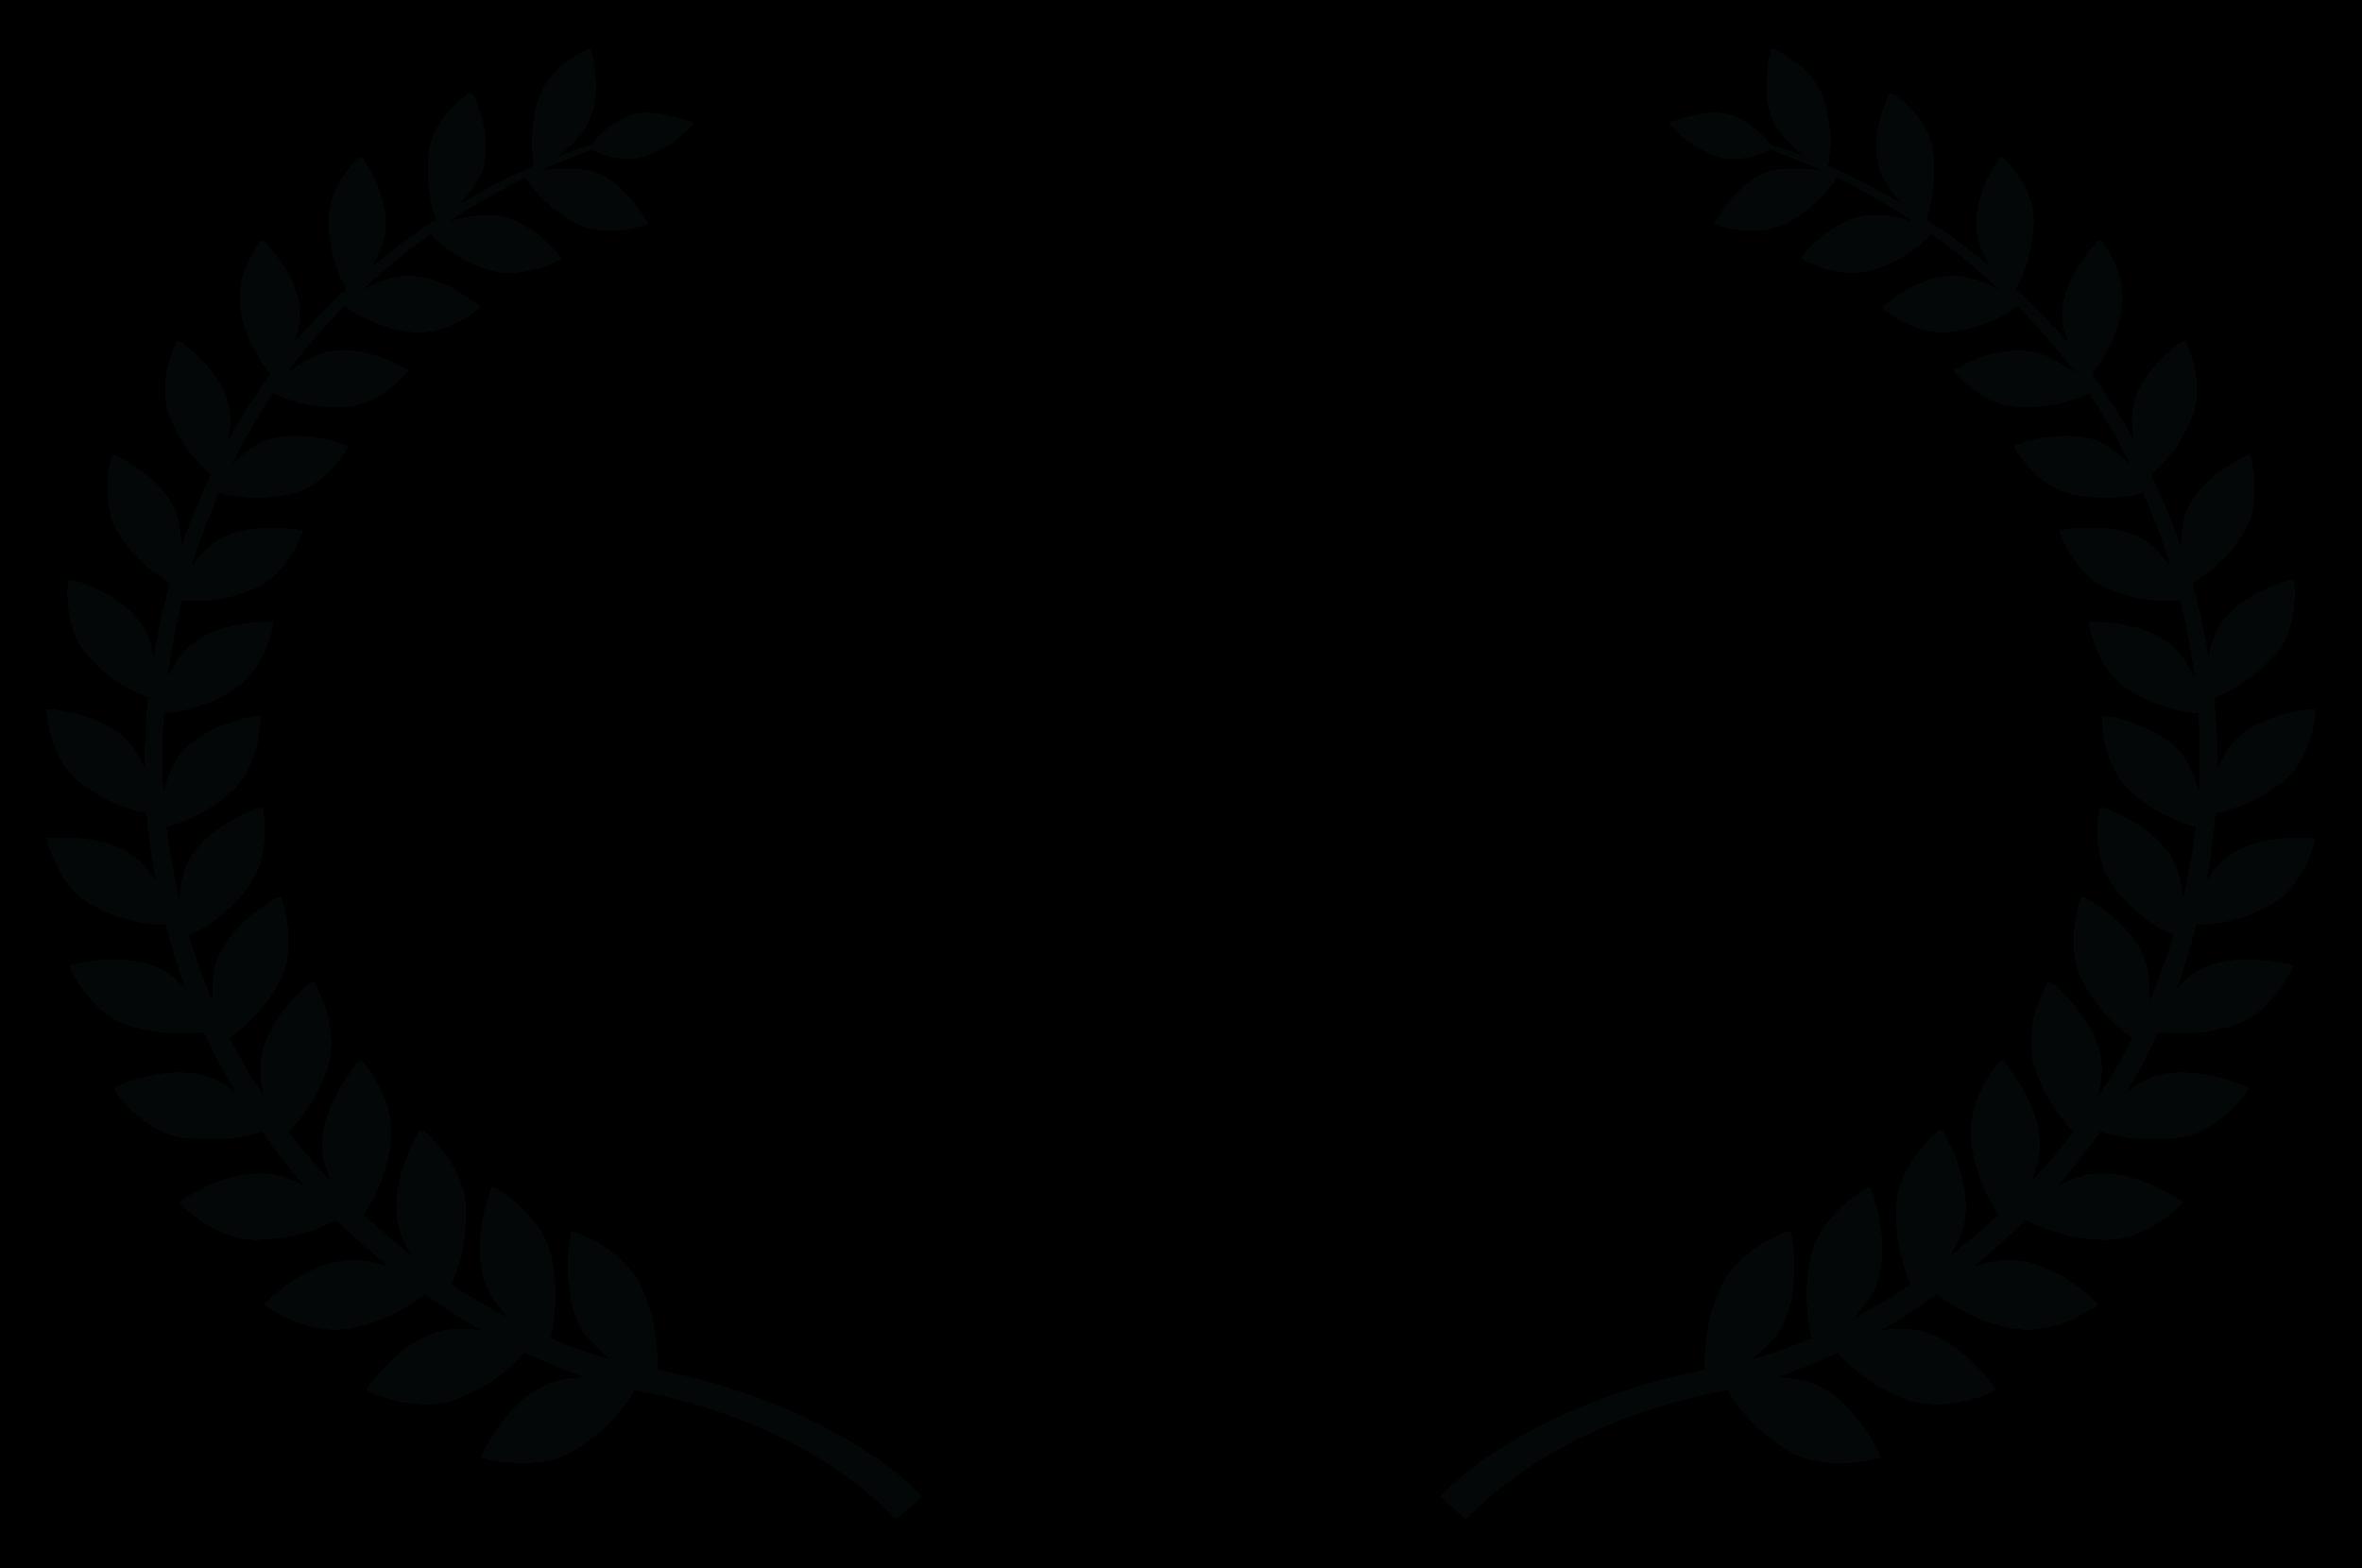 OFFICIALSELECTION-ComicsInFilmFestivalSFCC-2017.png